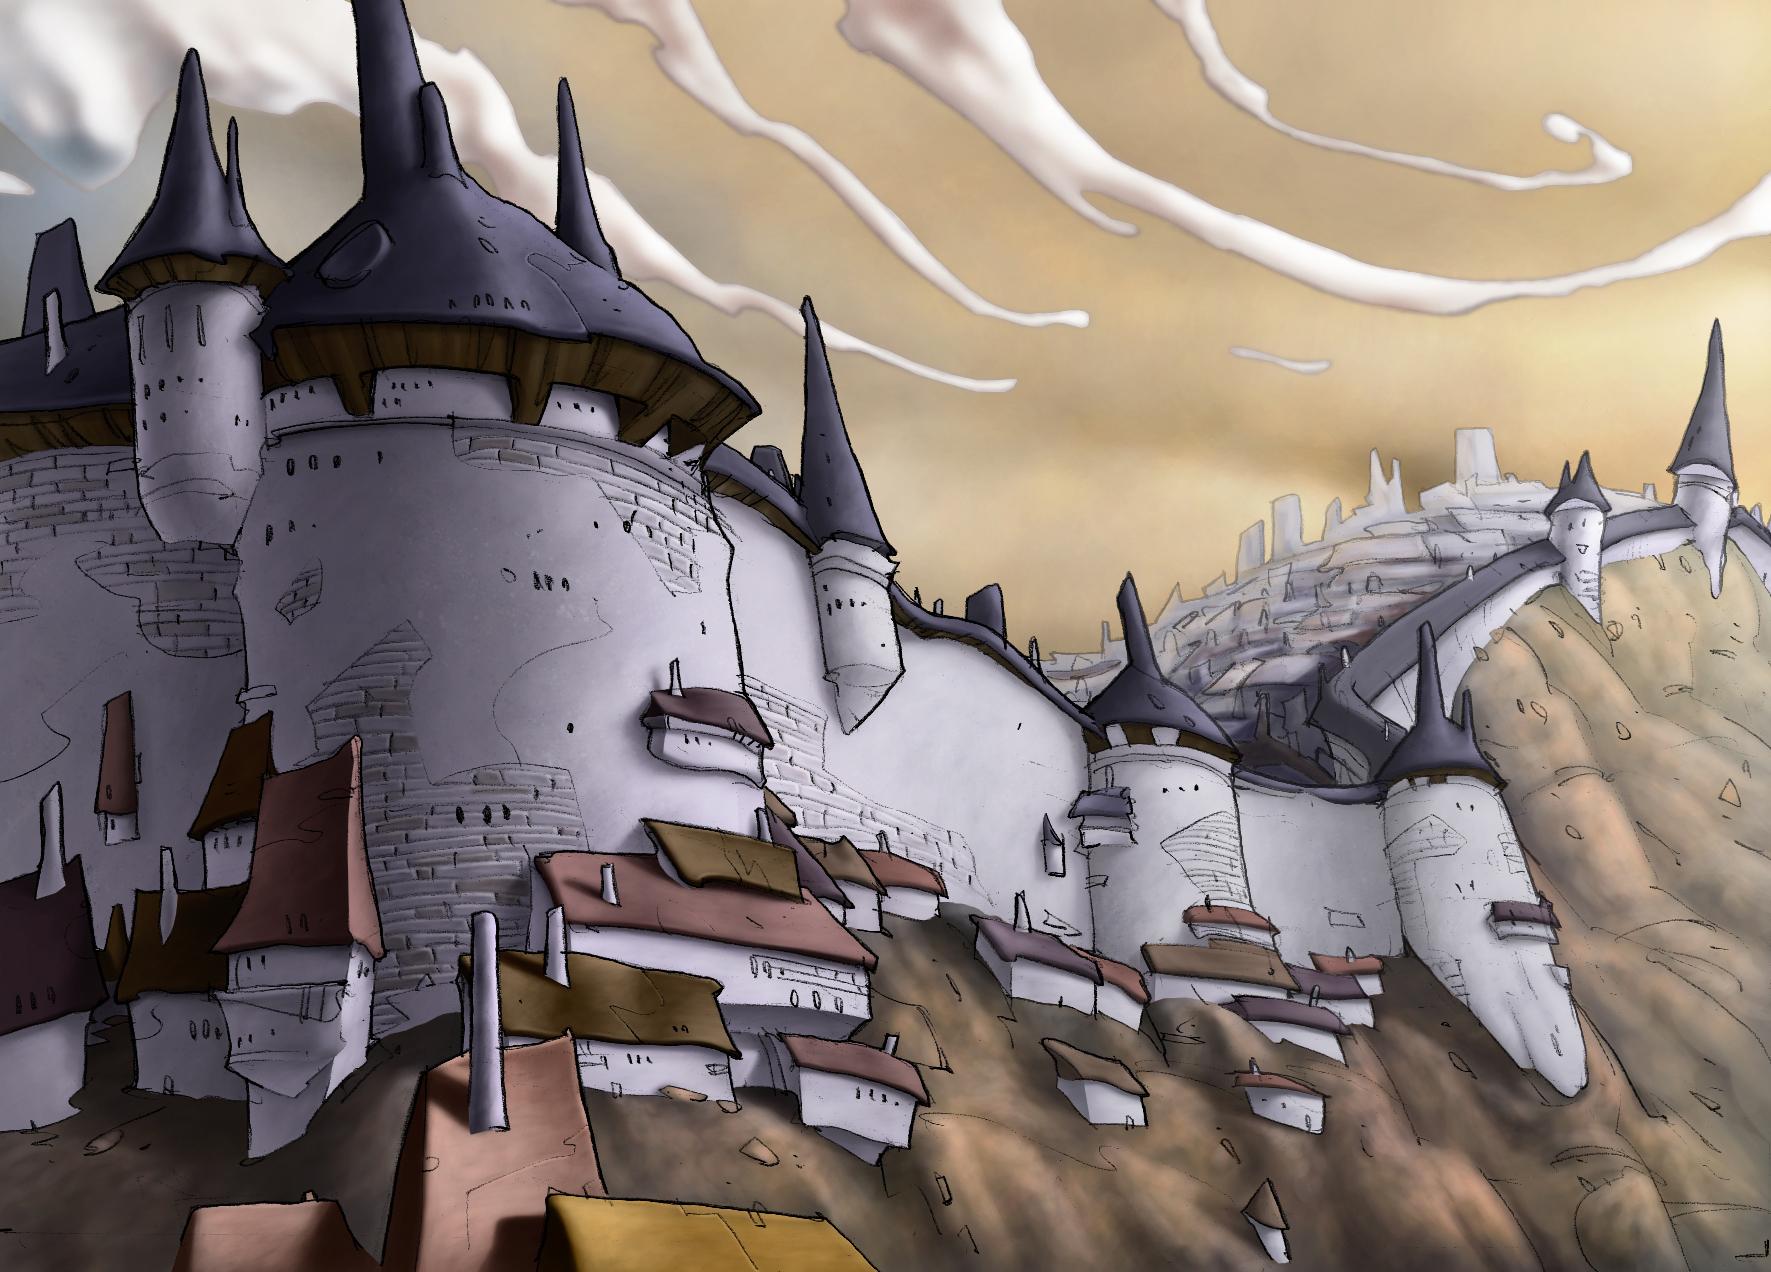 Cool Mini or Not | Wrath of Kings | Edouard Guiton | Eric Nouhaut